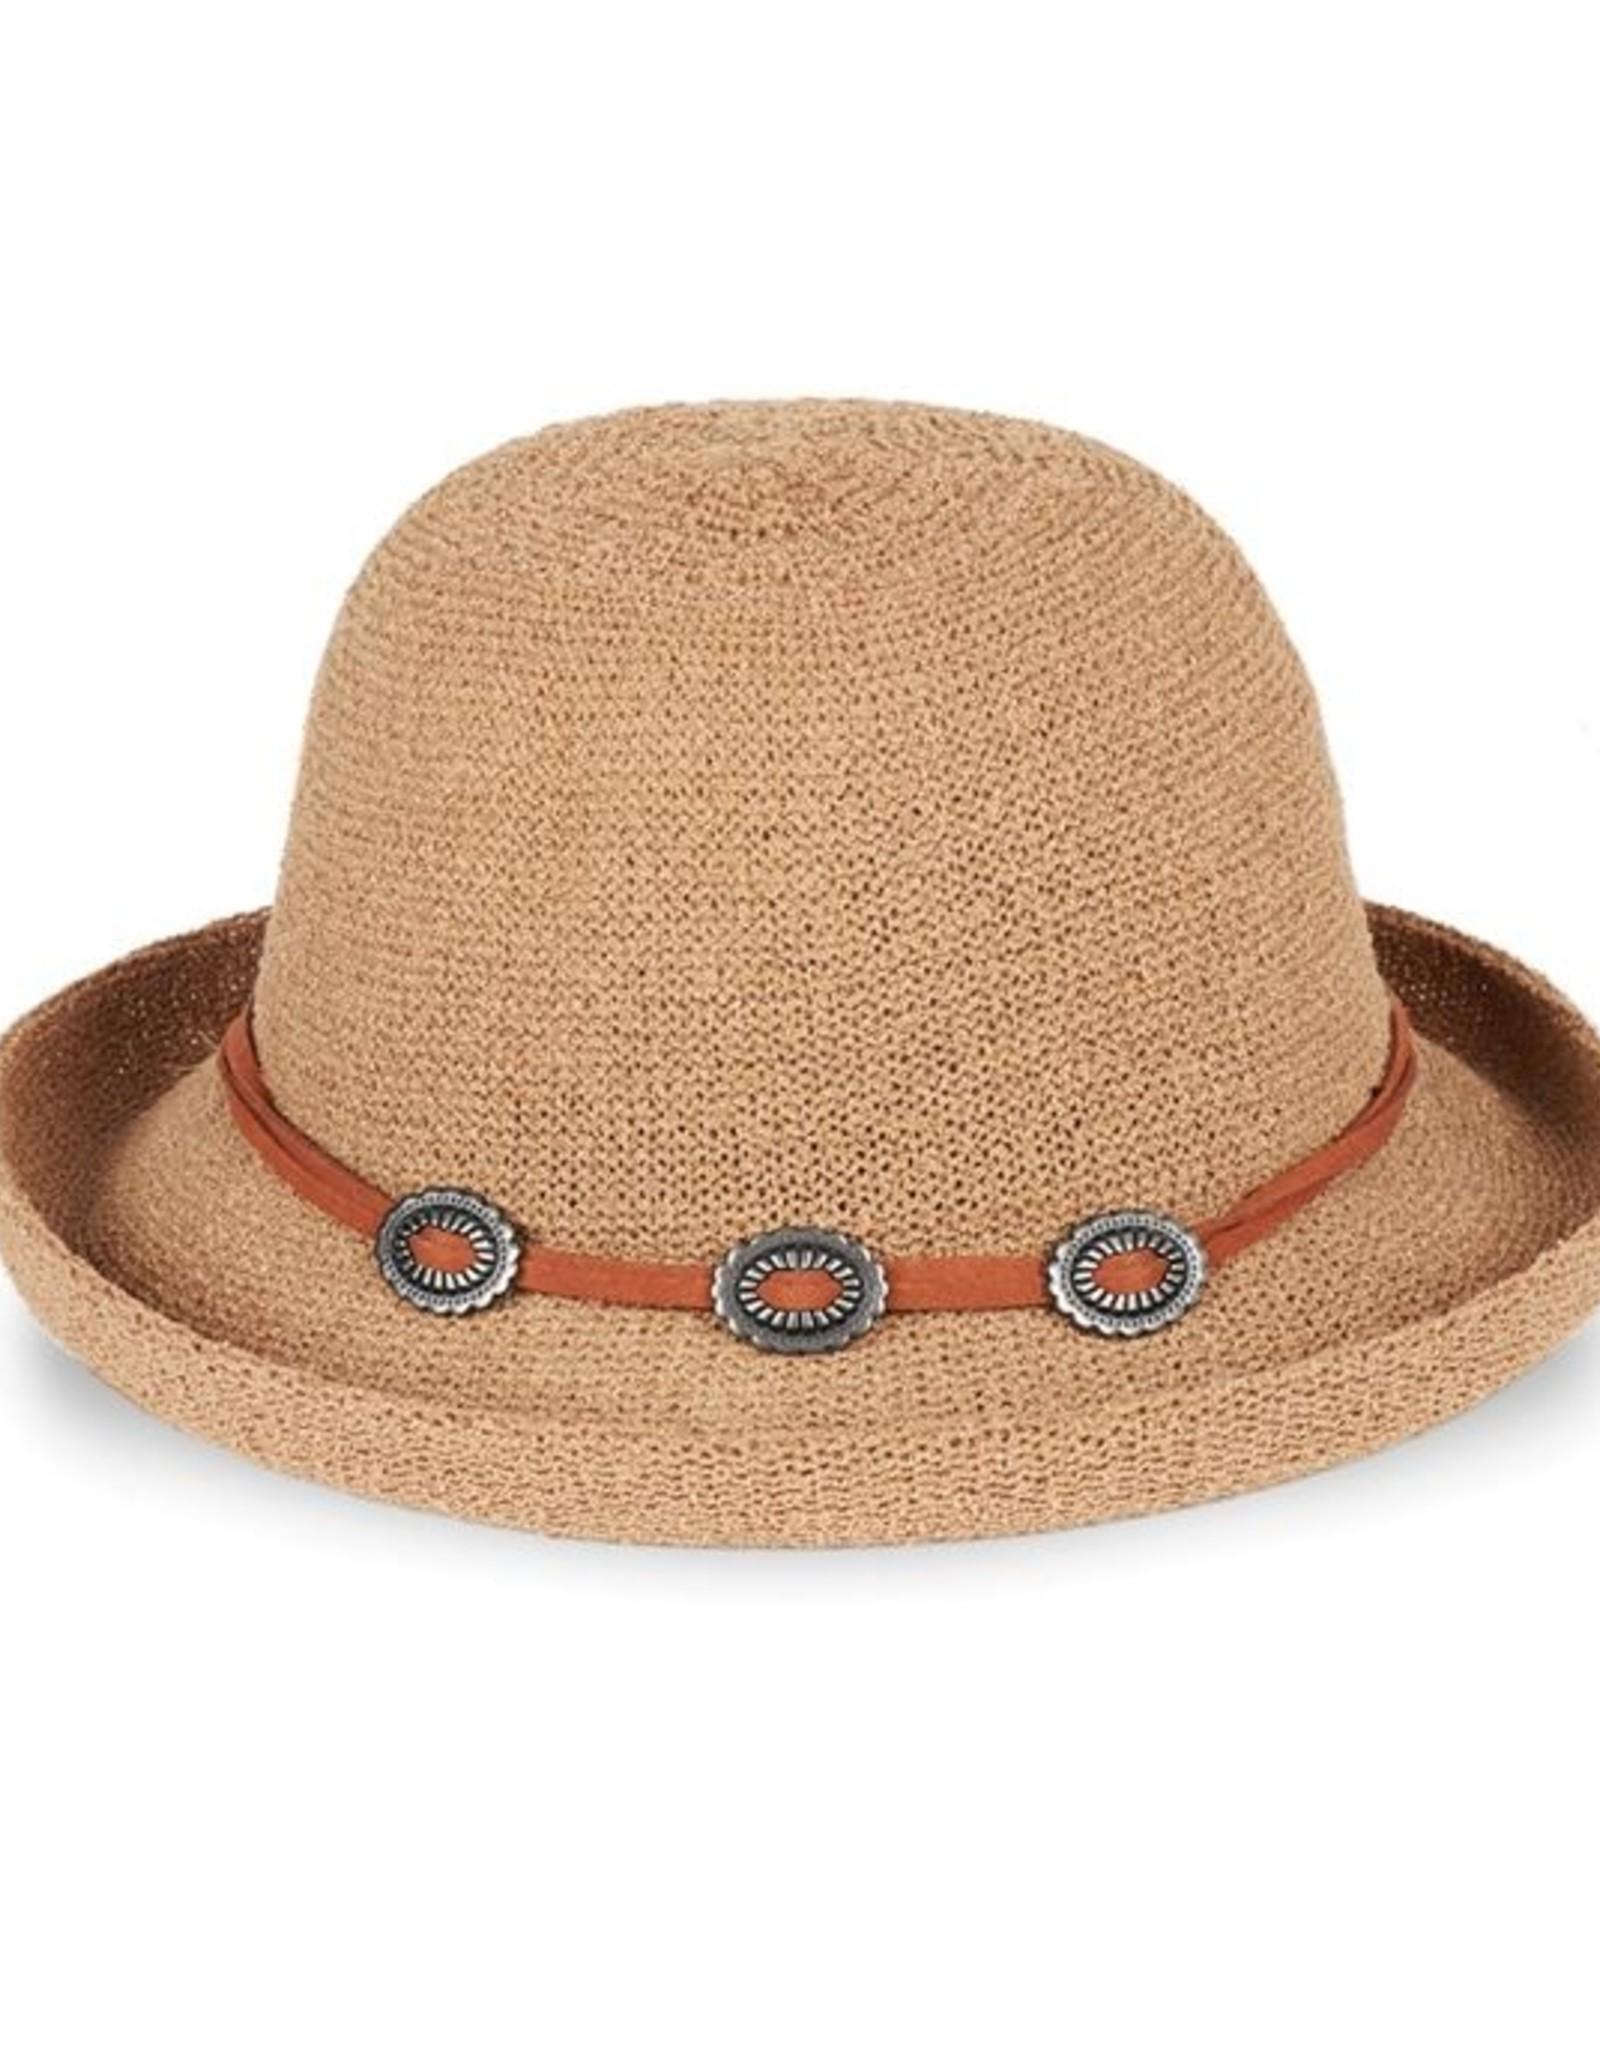 Coco & Carmen Mediterranean Hat w/ Concho